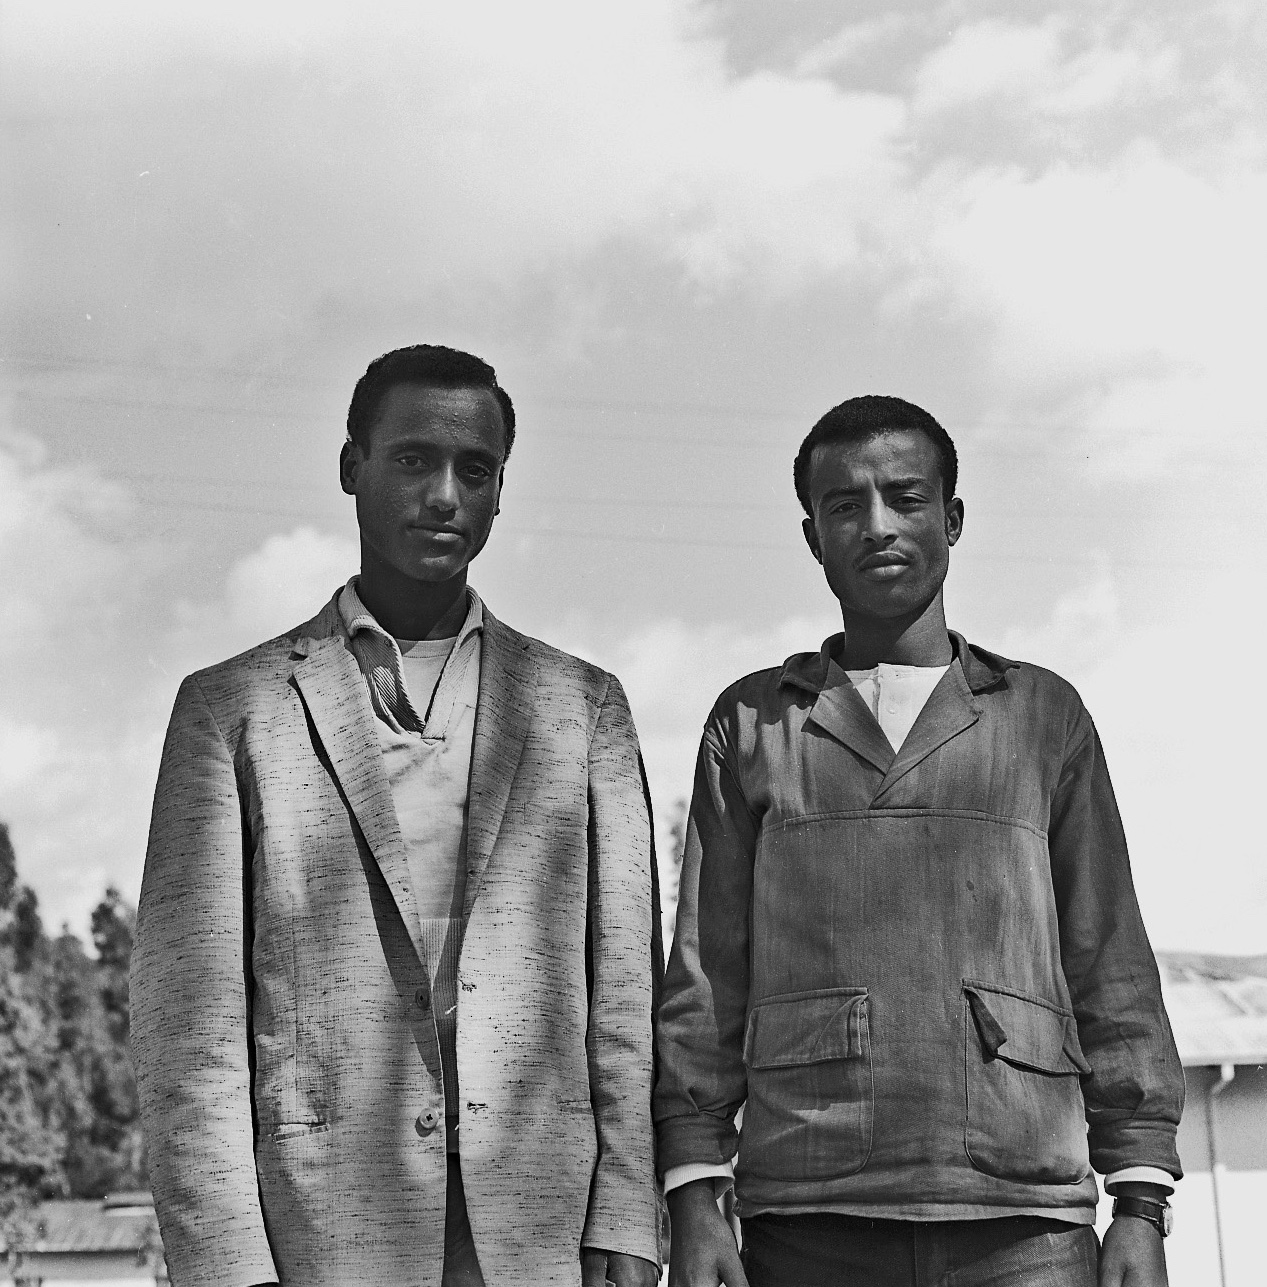 TMS-Students-Photo-2-taken-1963-1965_3